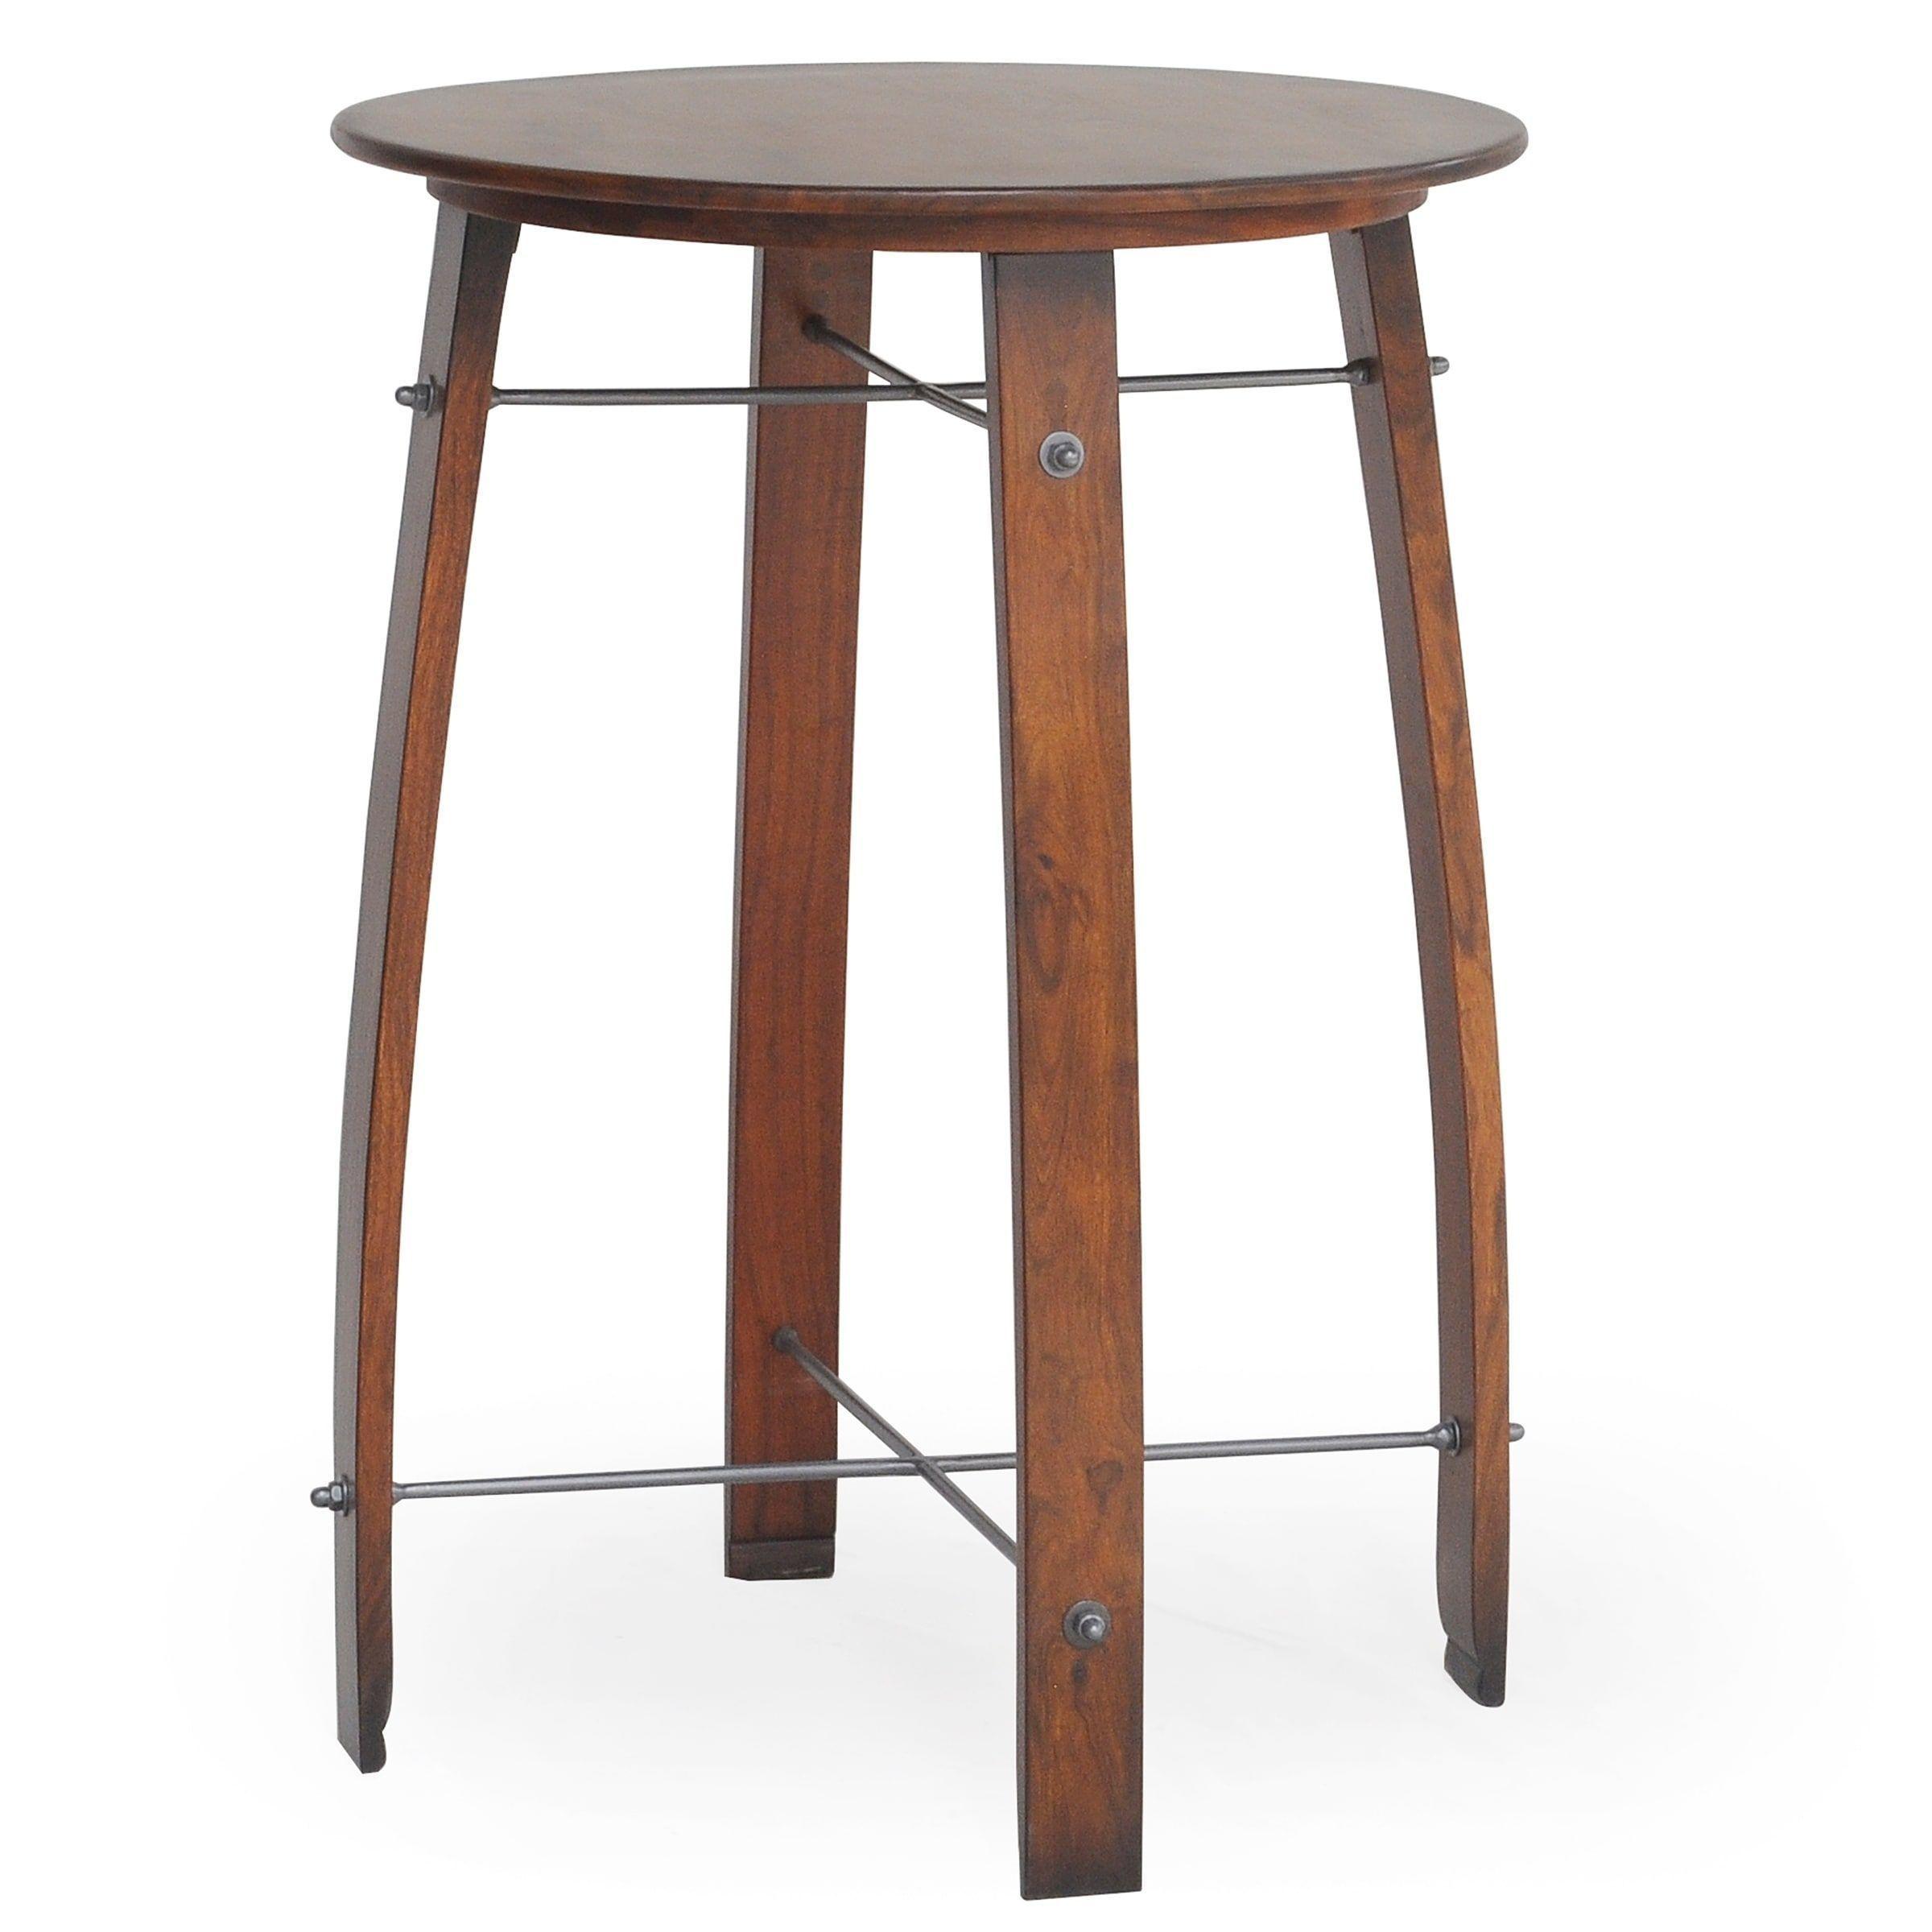 Cordelia Barrel Inch Round Pub Bar Table Chestnut Chestnut - 26 inch round coffee table